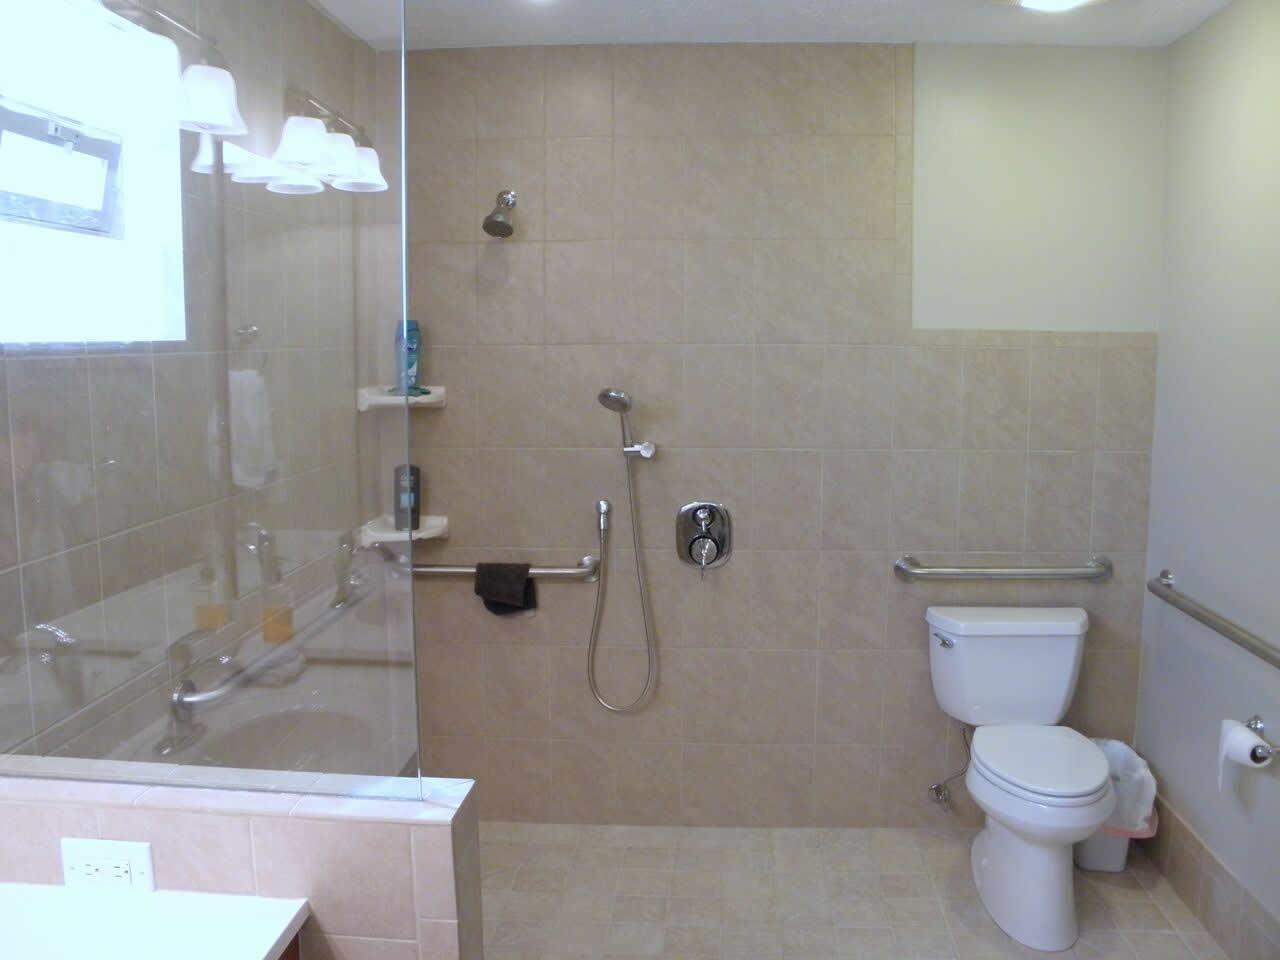 Handicap Showers Make Home Life Easier